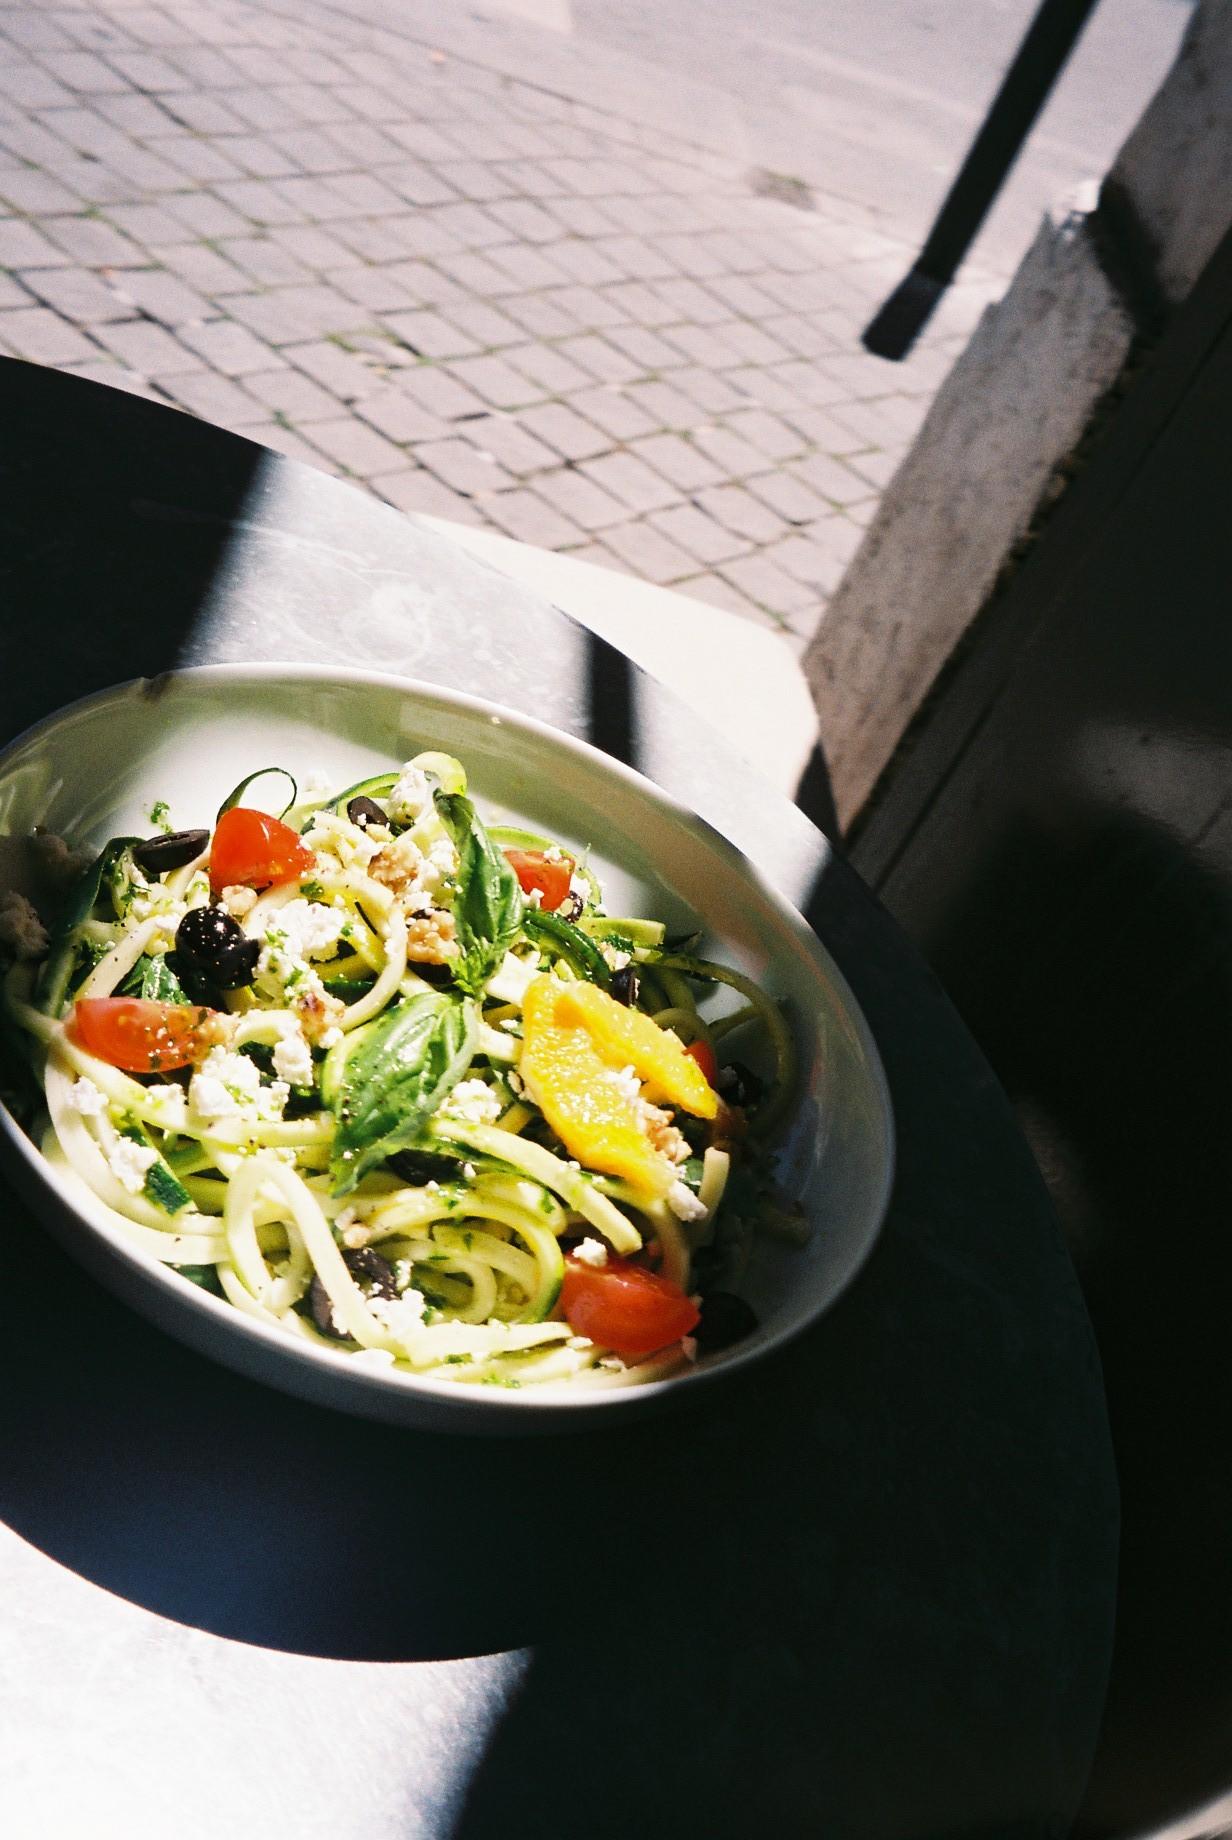 Having lunch by myself in between meetings in café Janis in Lisbon.  / A almoçar sozinha entre reuniões no café janis em Lisboa.